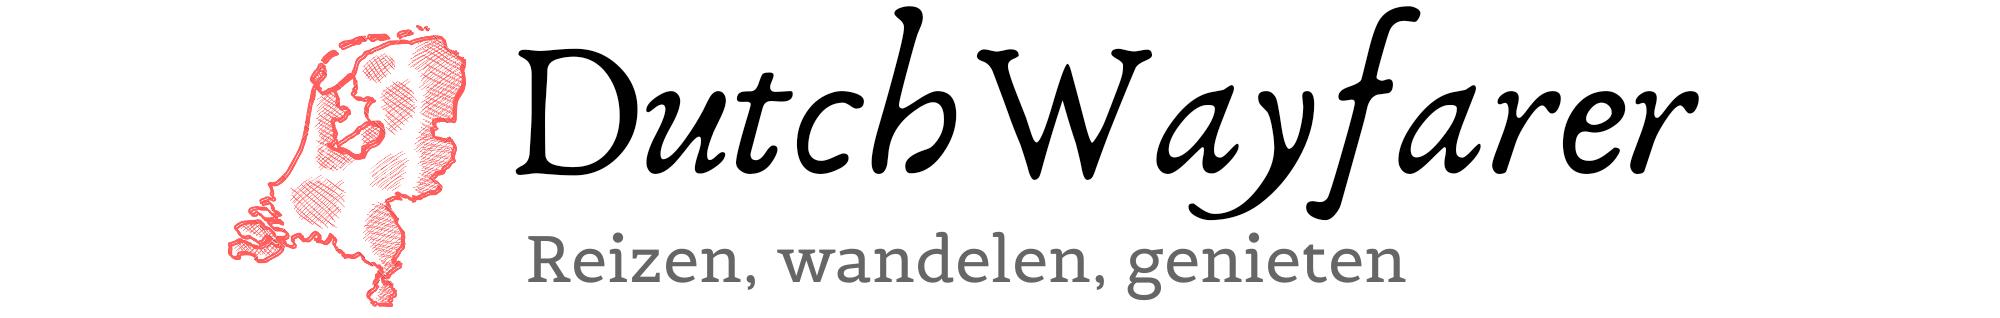 DutchWayfarer